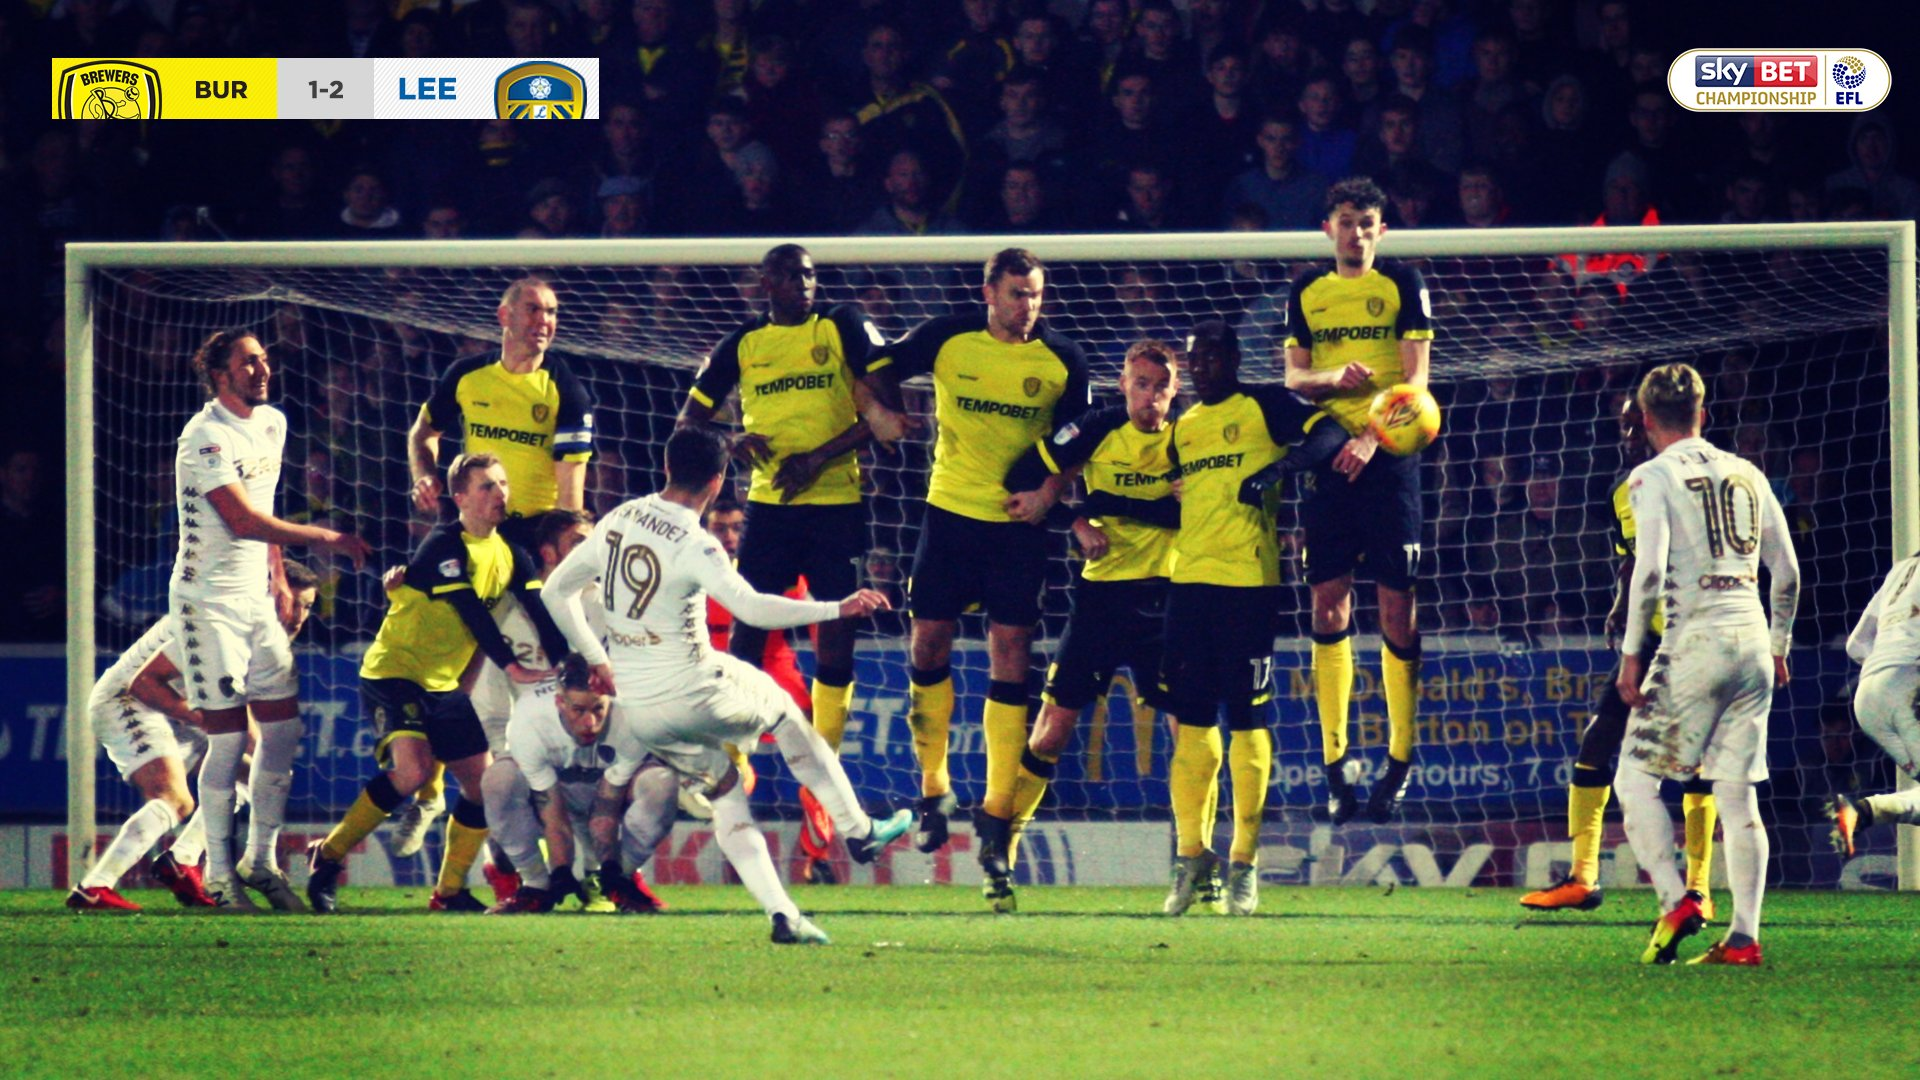 Burton Albion – Leeds 1-2